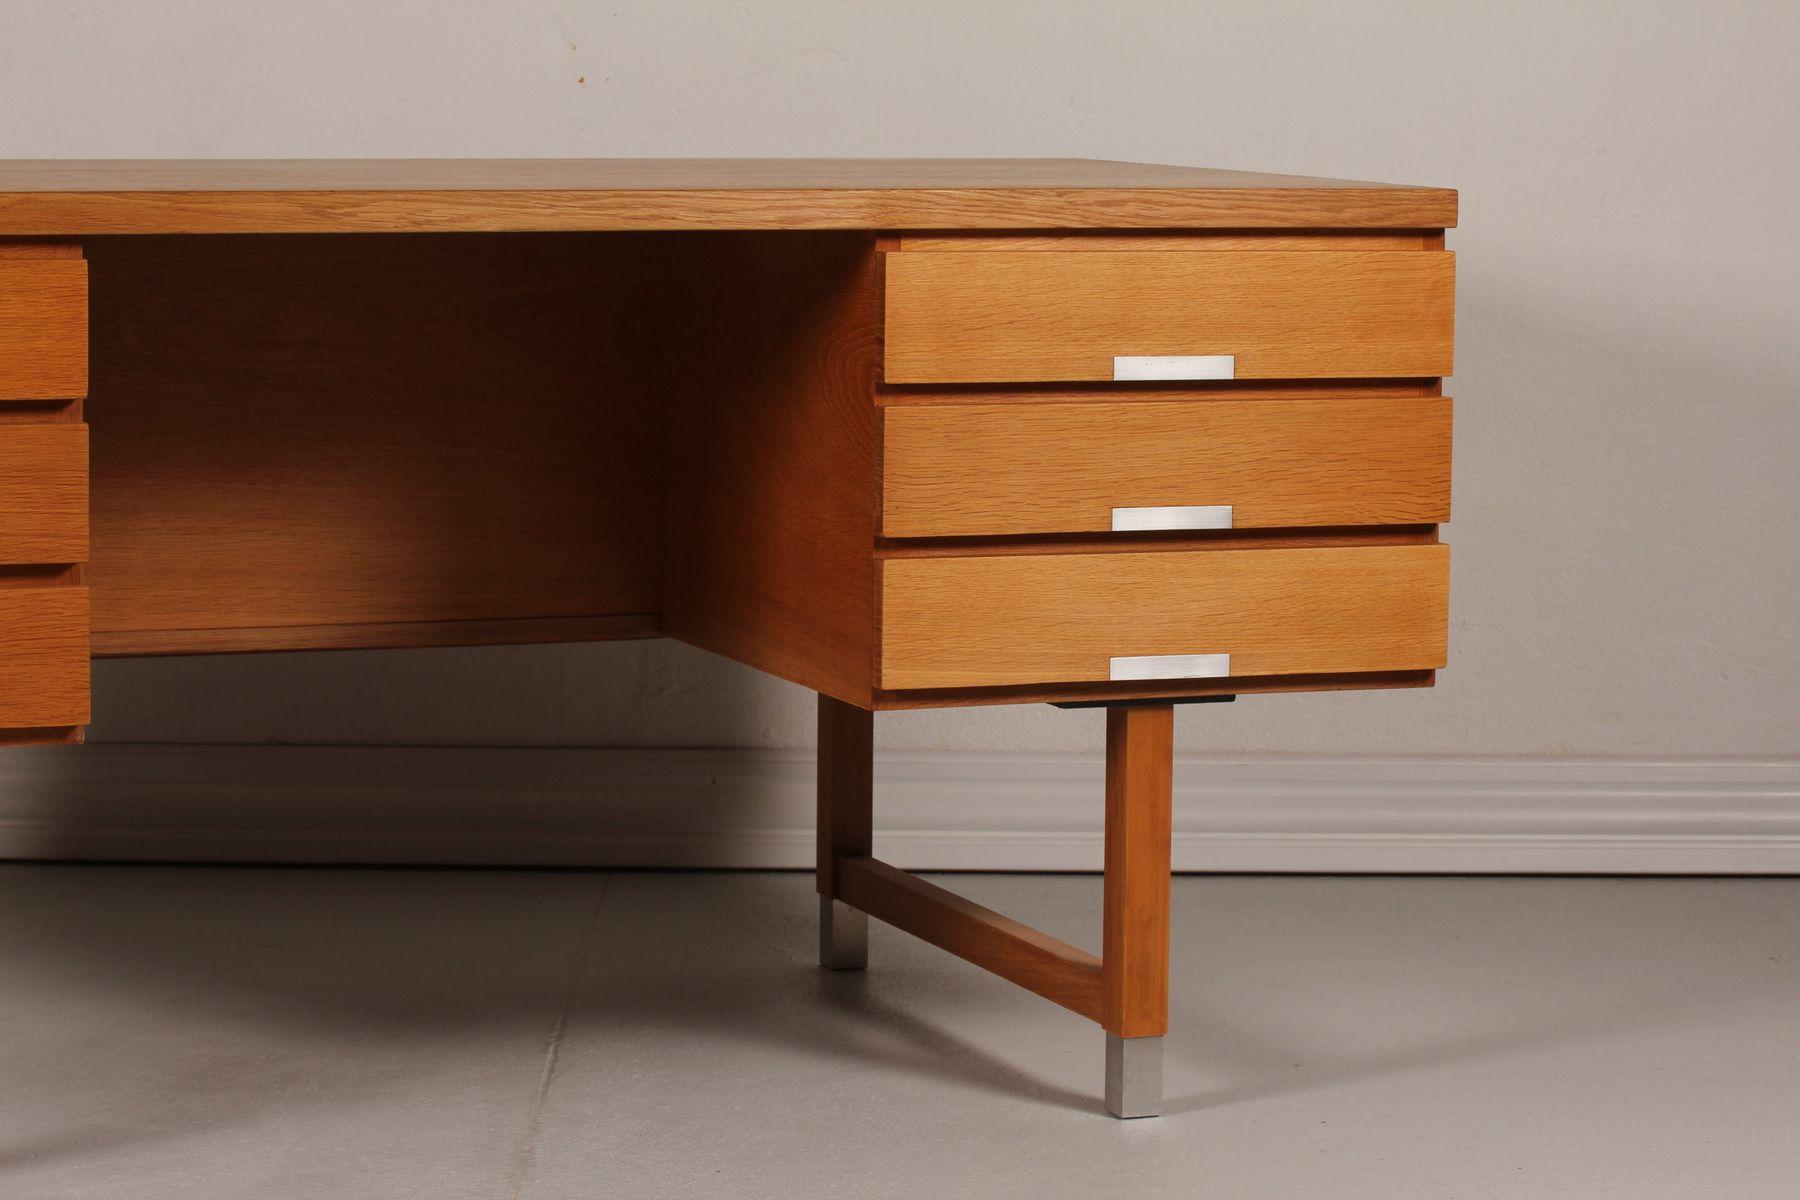 Oak Desk With Drawers ~ Danish oak desk with six drawers by kai kristiansen s